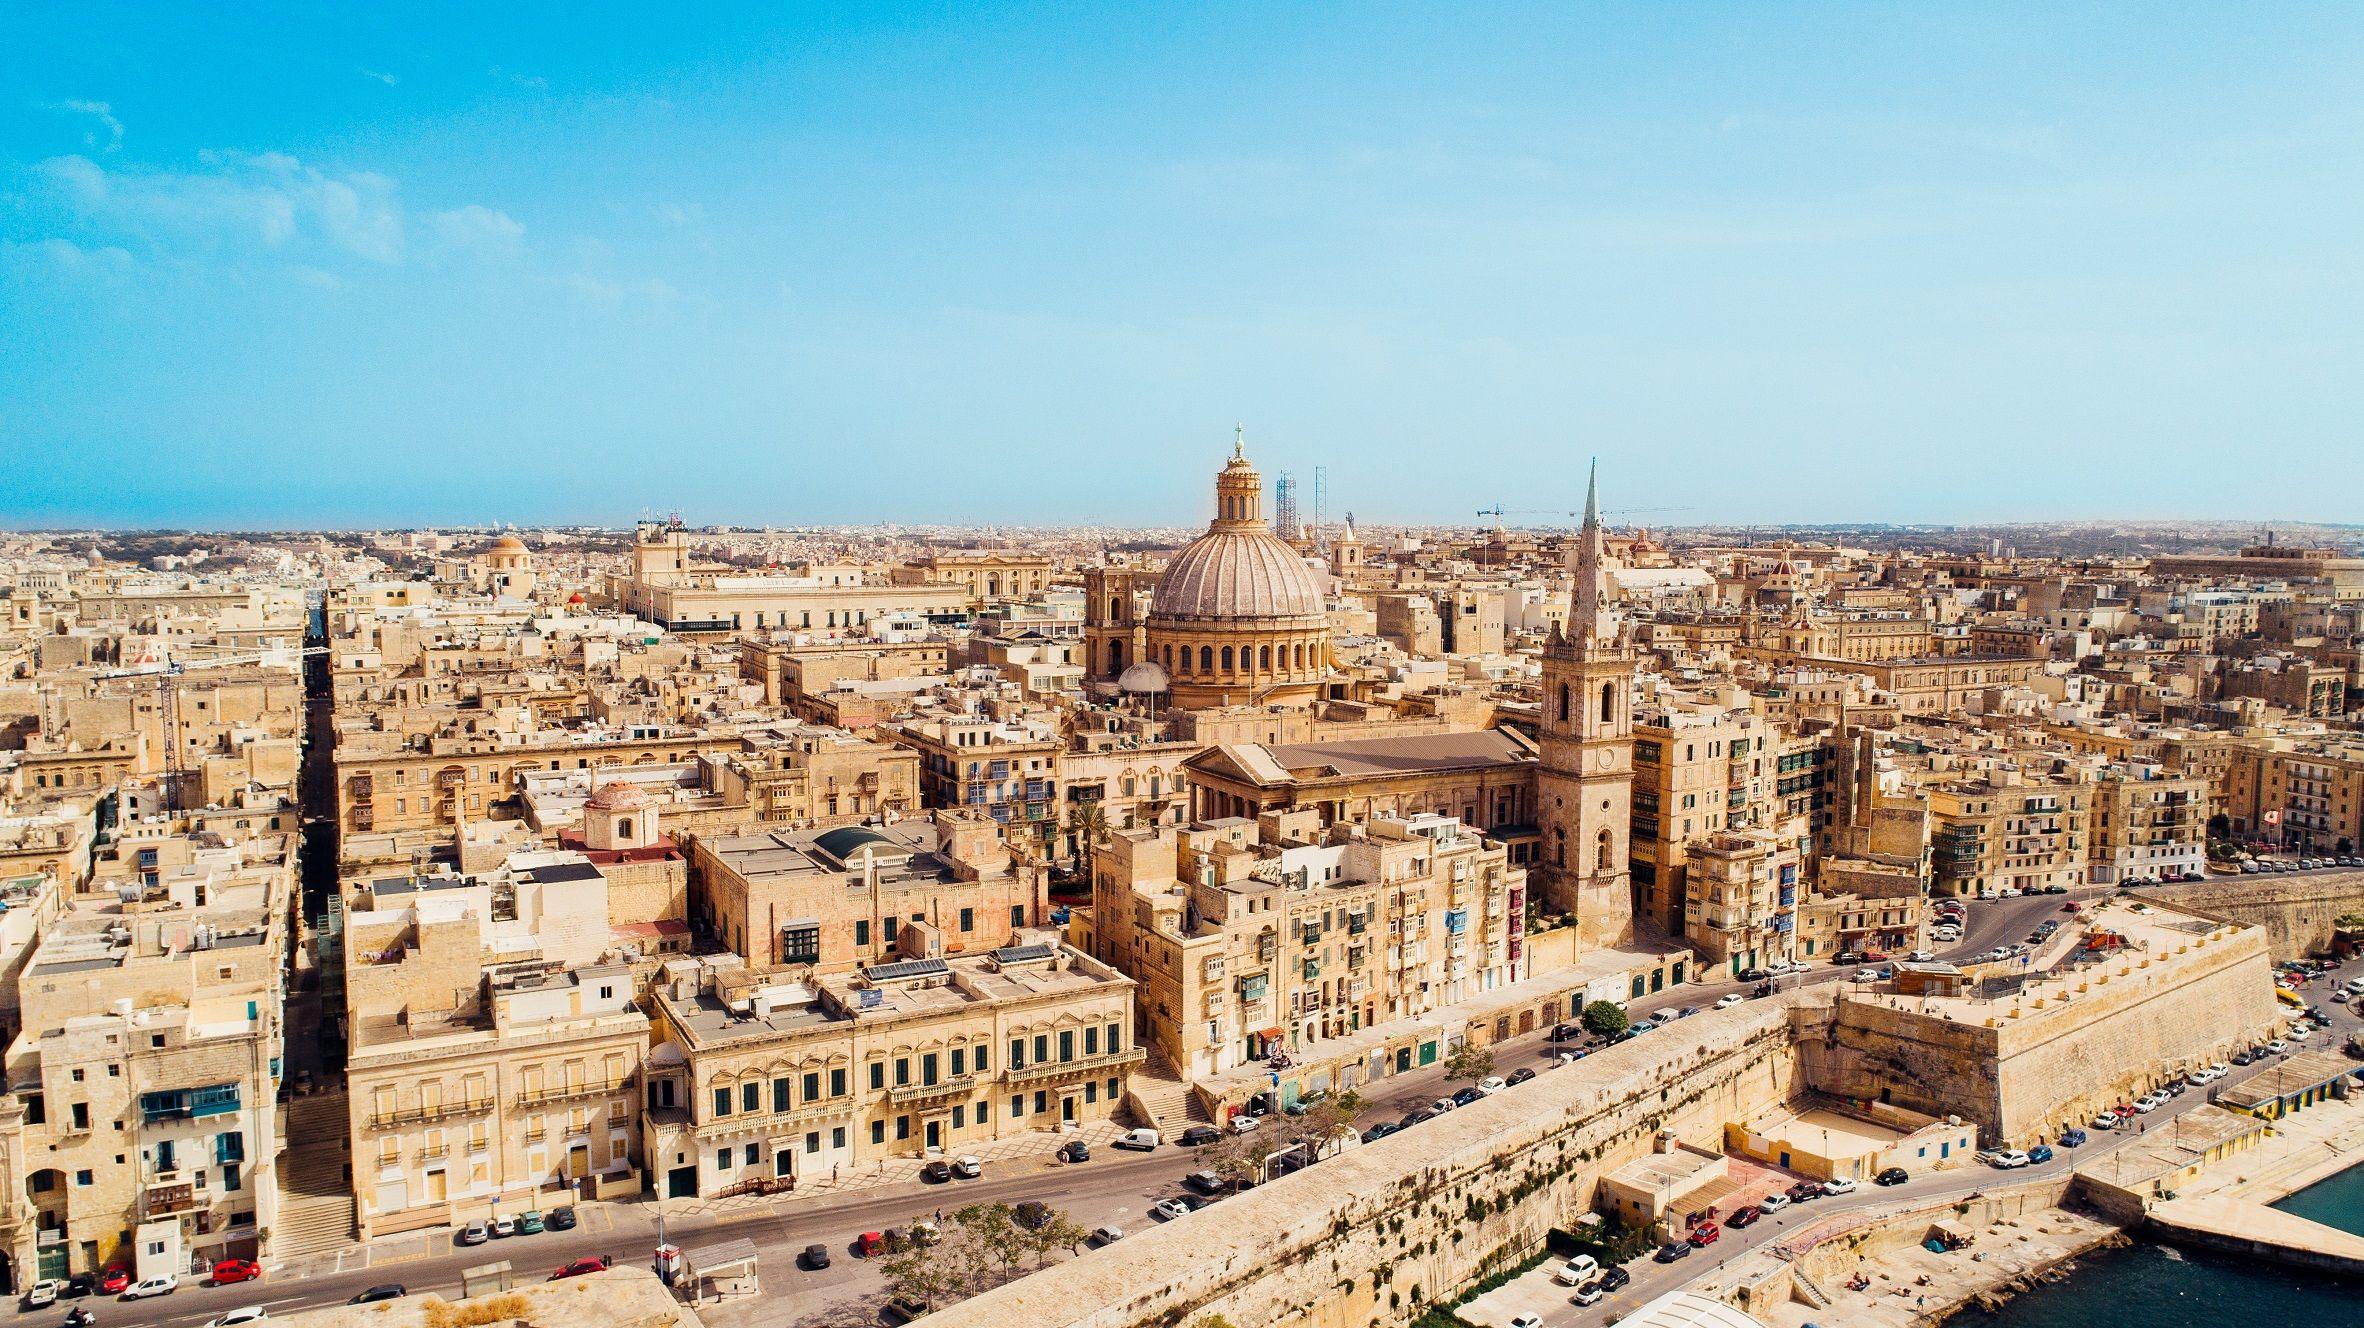 Valletta! #VisitMalta #Valletta #CityBreak #CityOfCulture #WorldHeritageSite #Photography